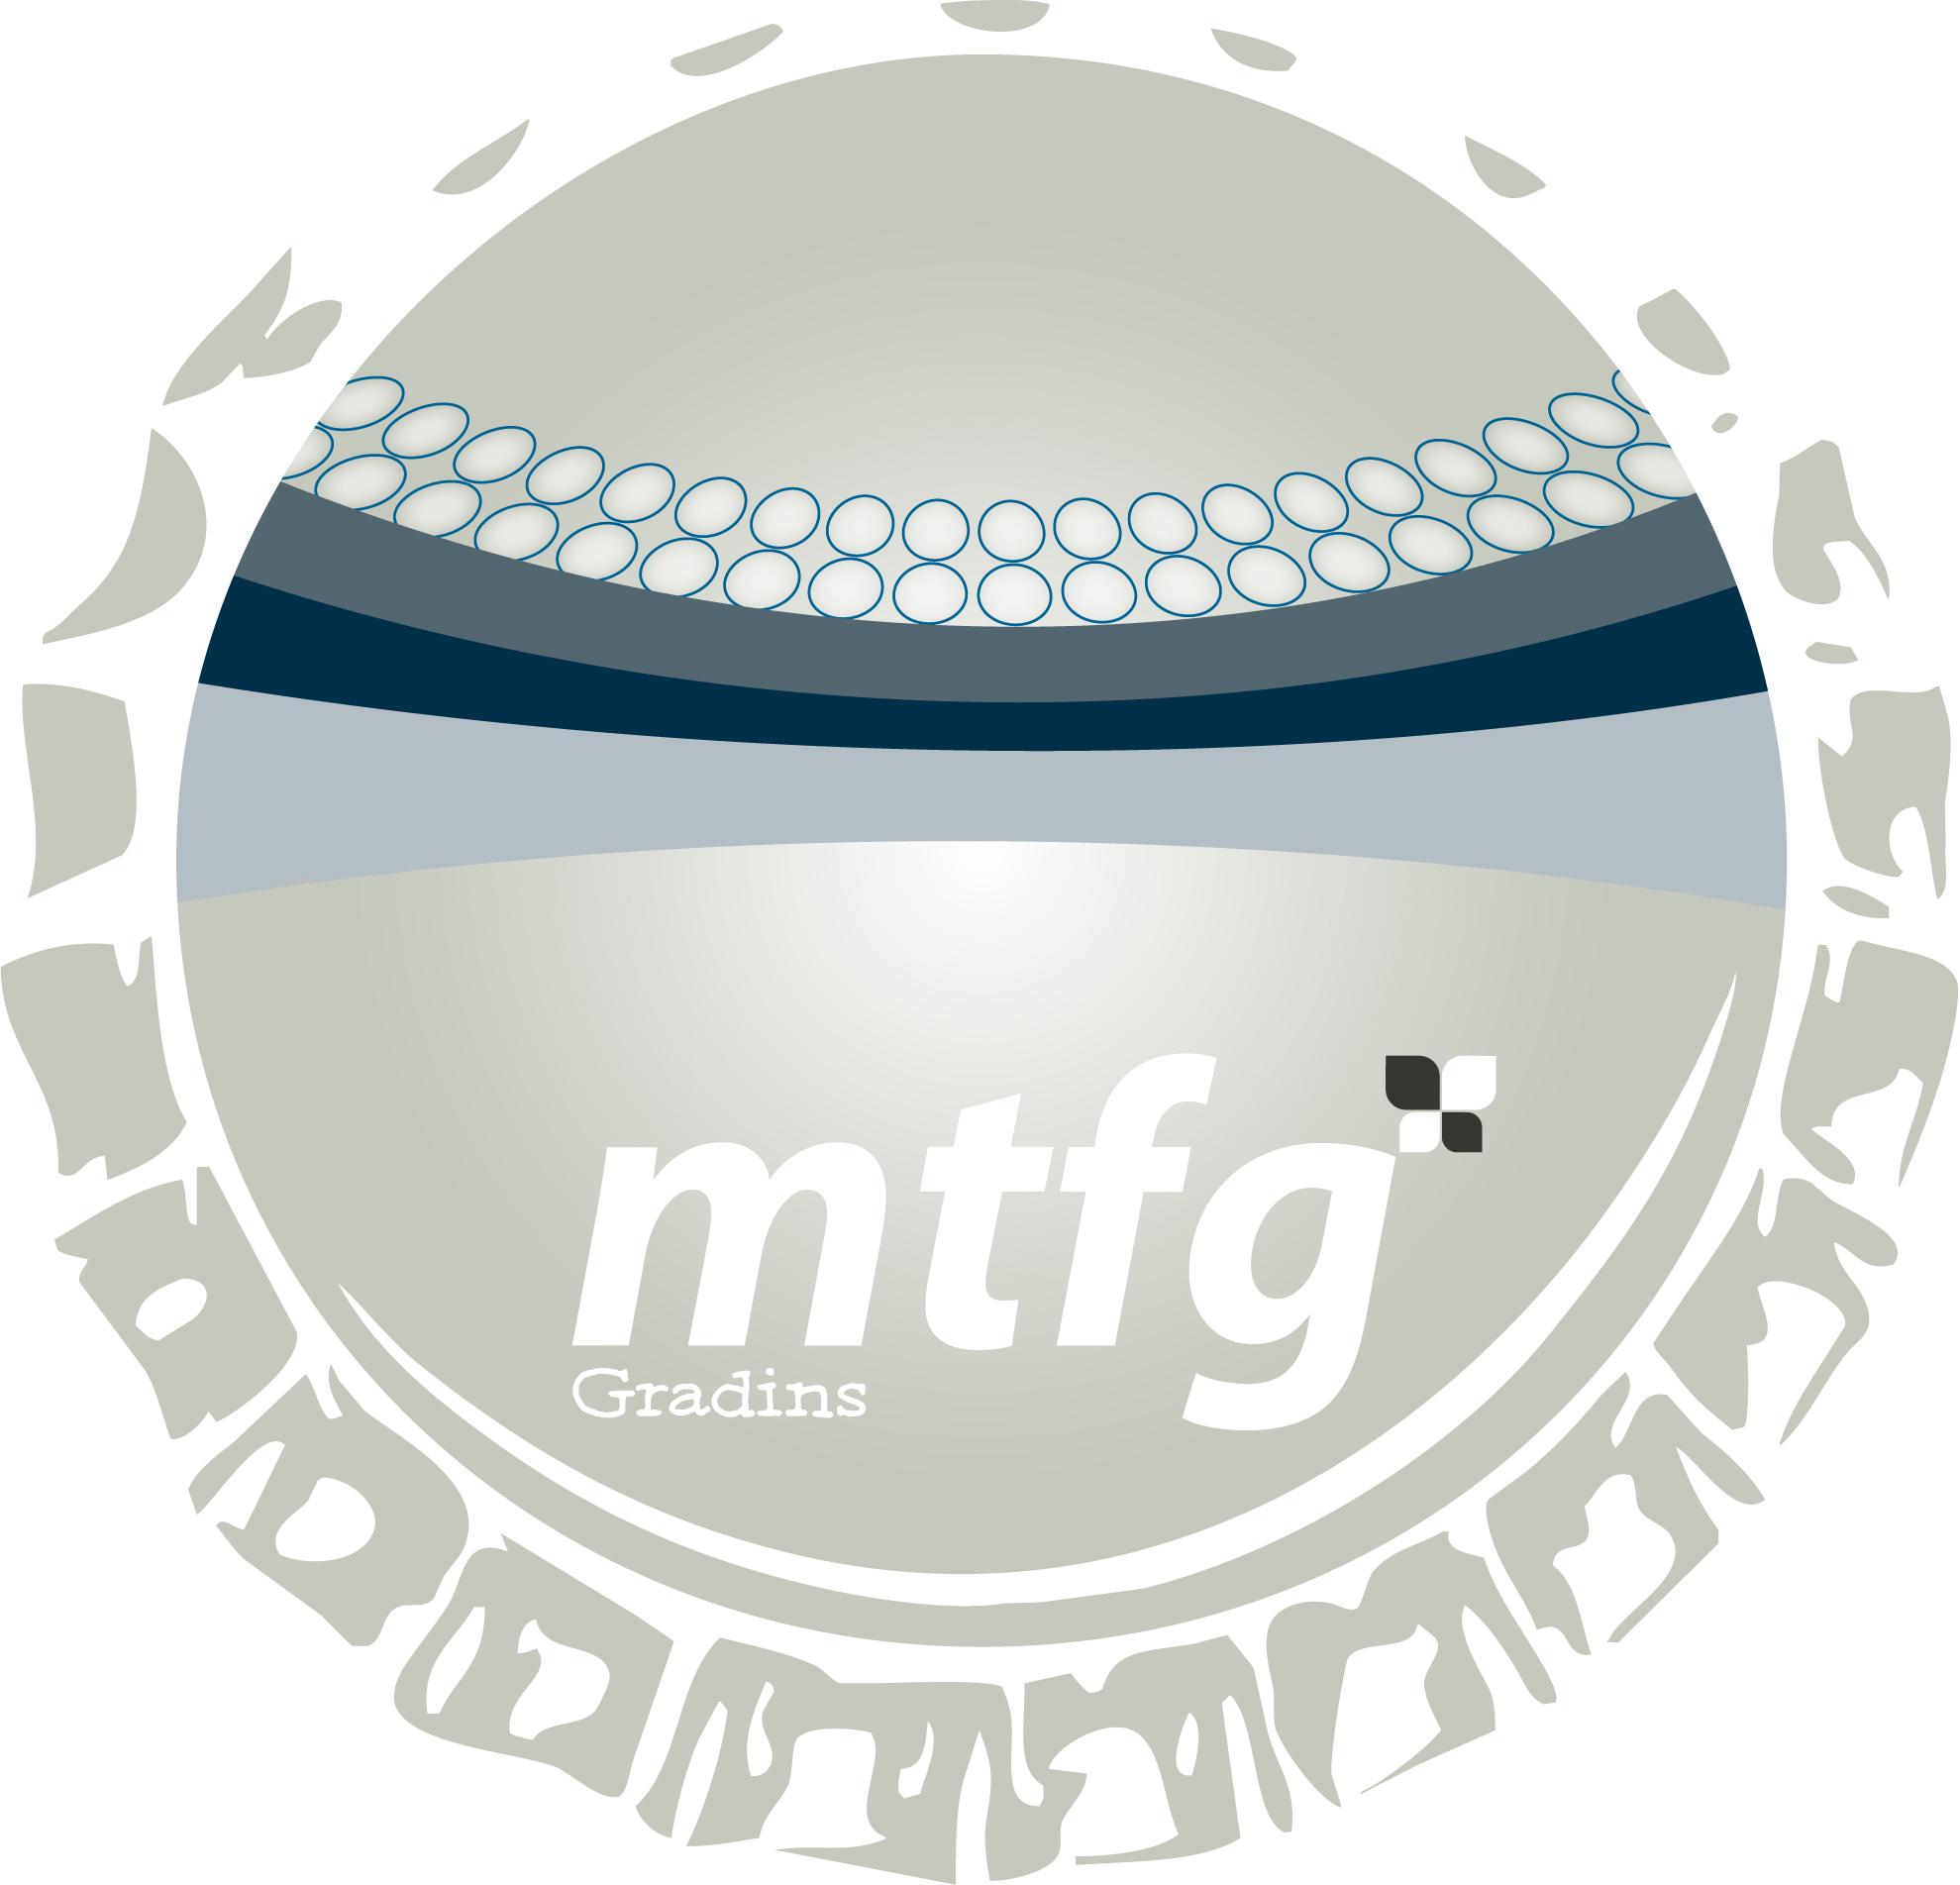 MTFG Gradins